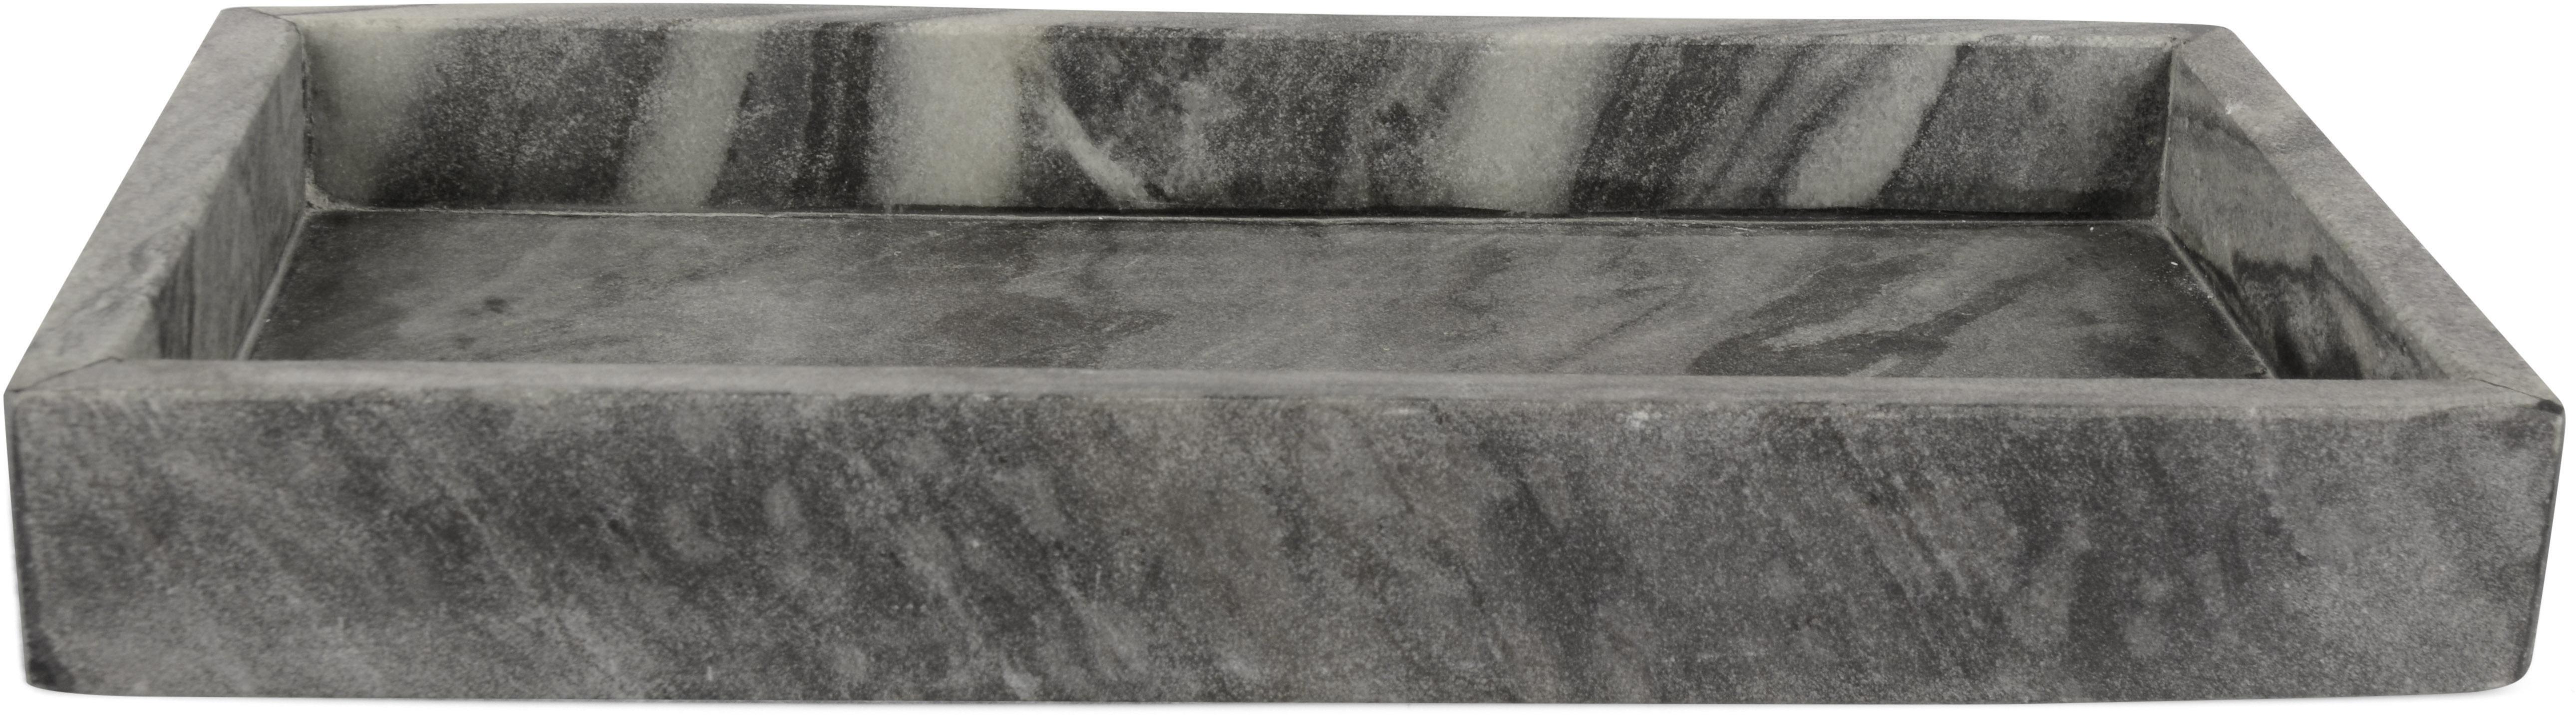 Bandeja decorativa de mármol Mera, Mármol, Gris, veteado, An 30 x F 15 cm